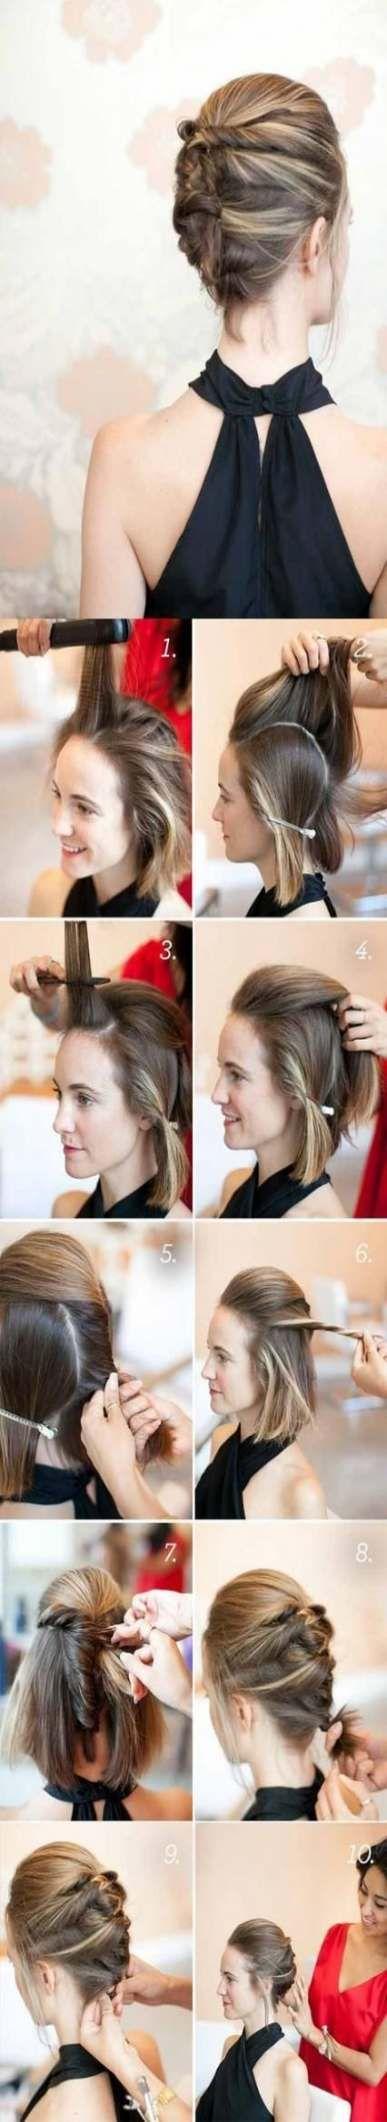 diy ponytail haircut for medium length hair haircut diy tutorials ponytail 68 best ideas diy